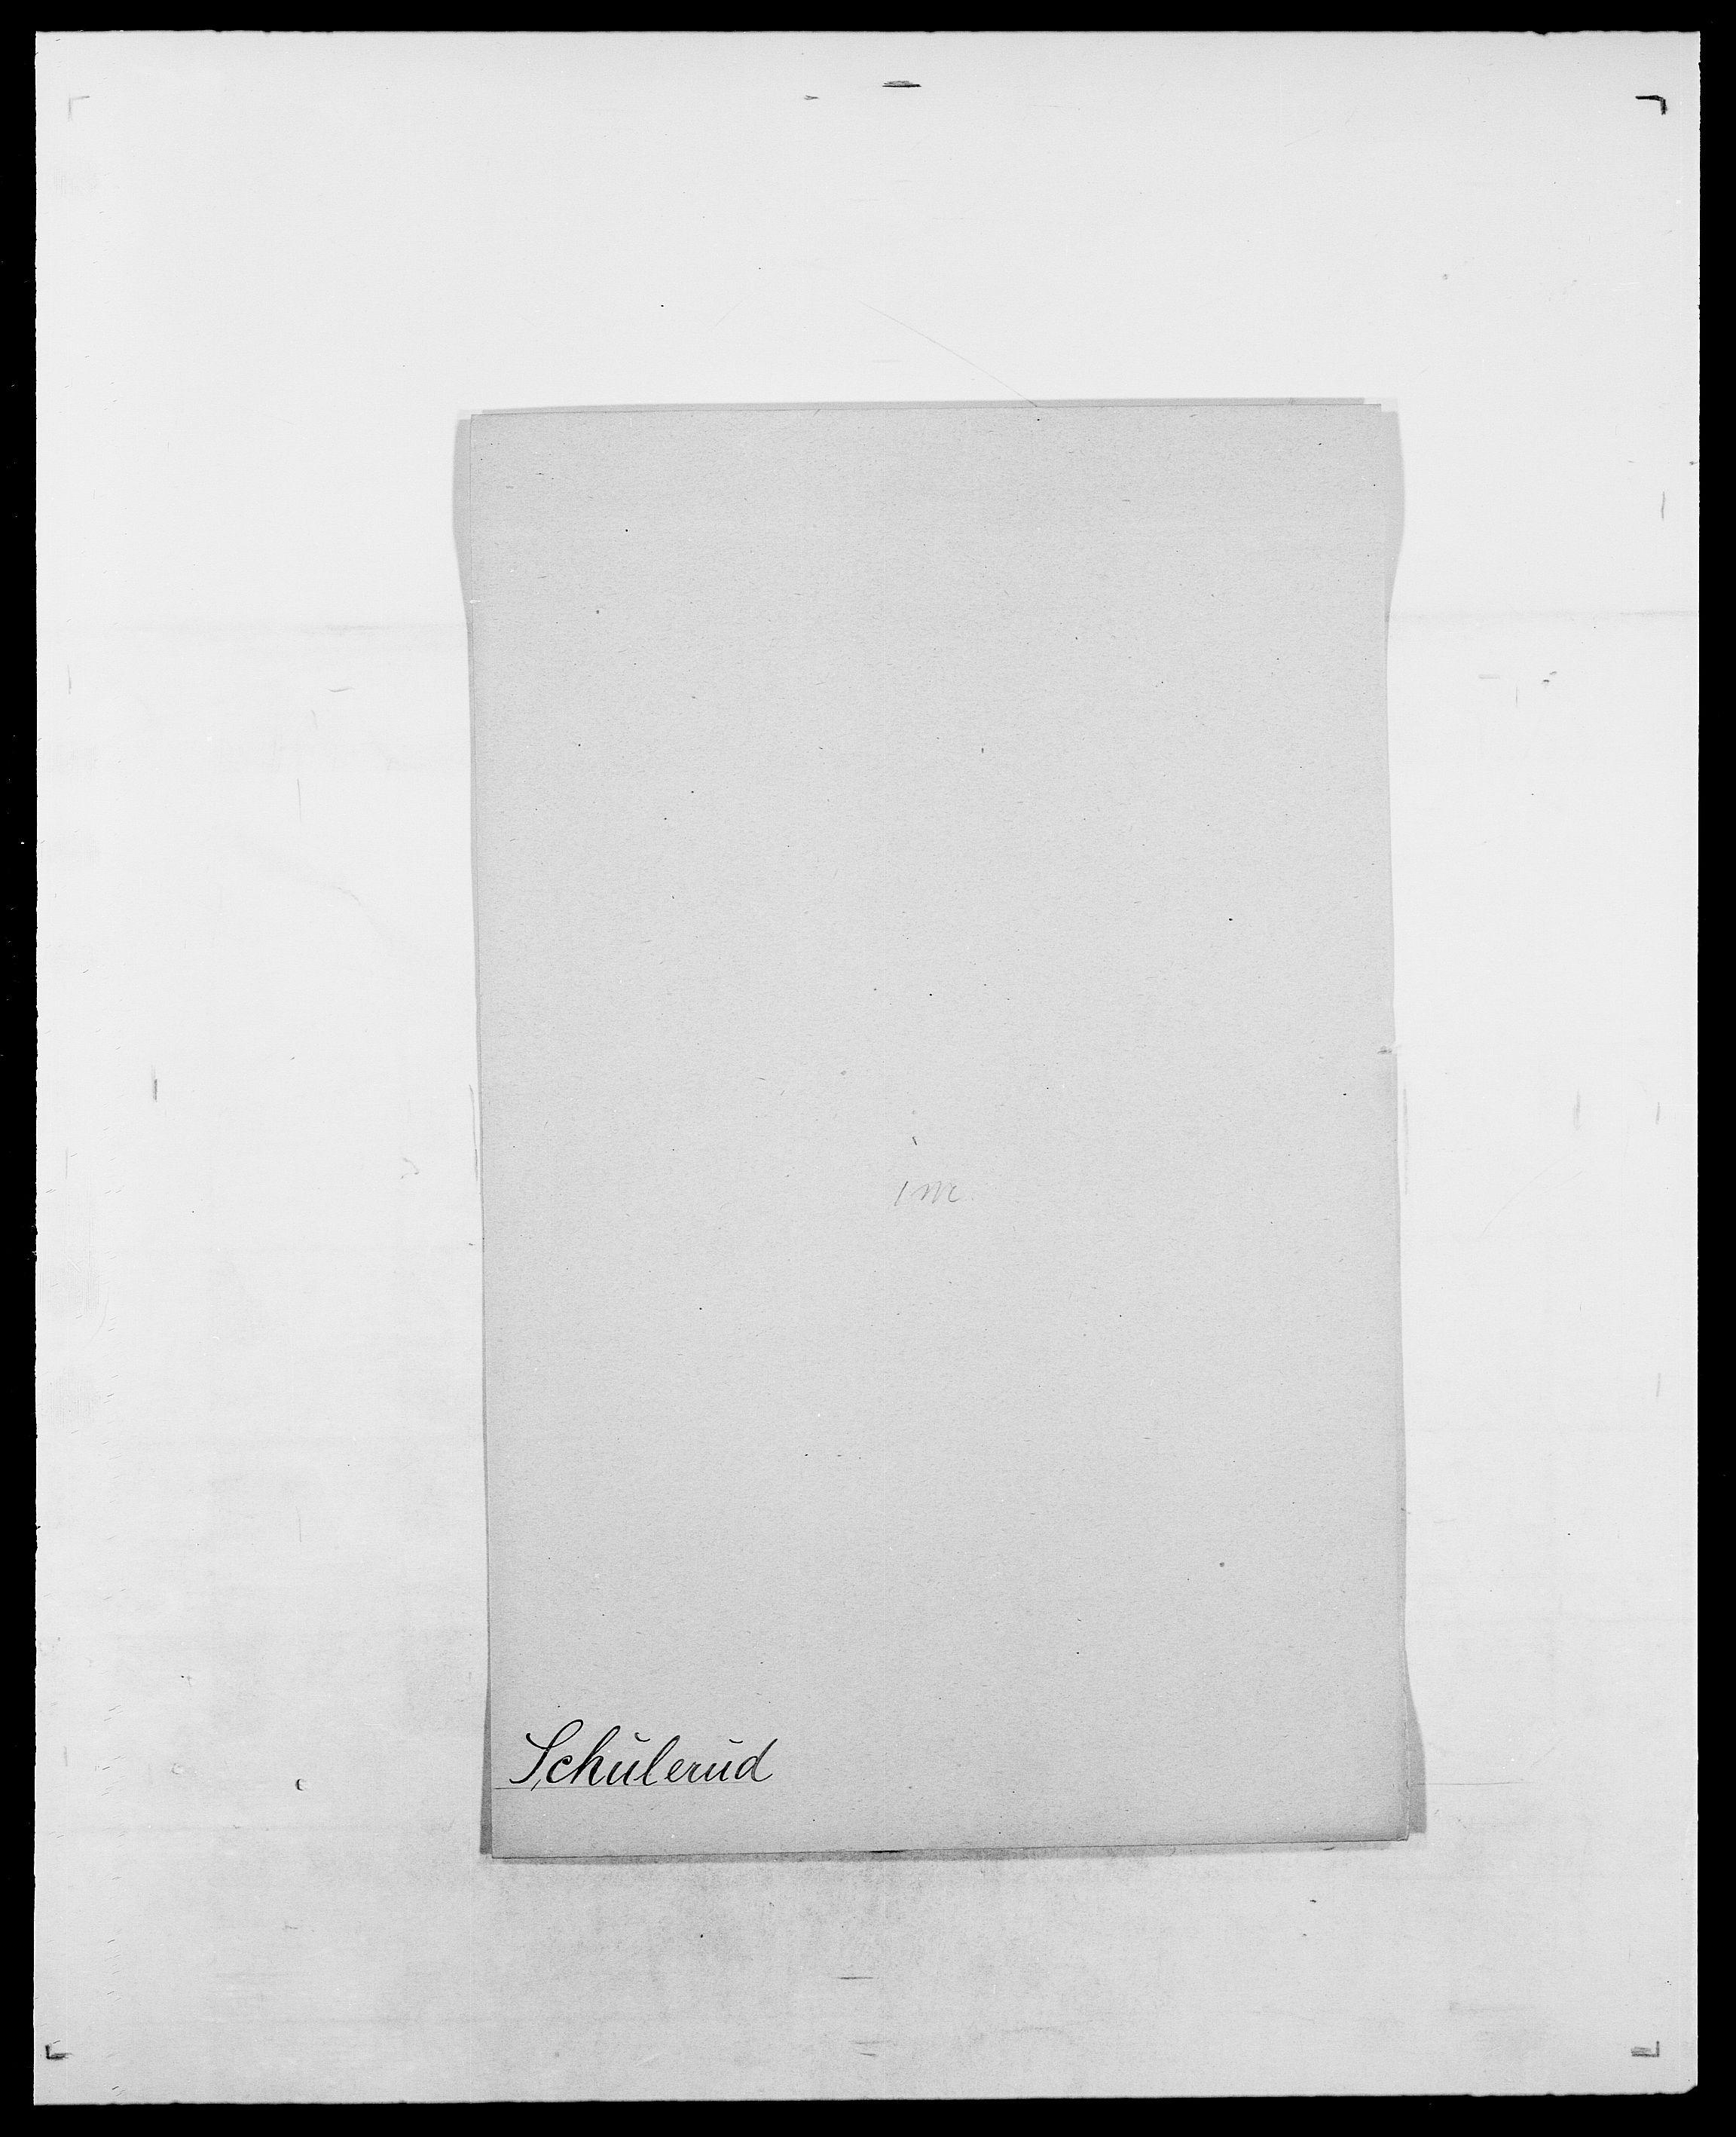 SAO, Delgobe, Charles Antoine - samling, D/Da/L0035: Schnabel - sjetman, s. 262